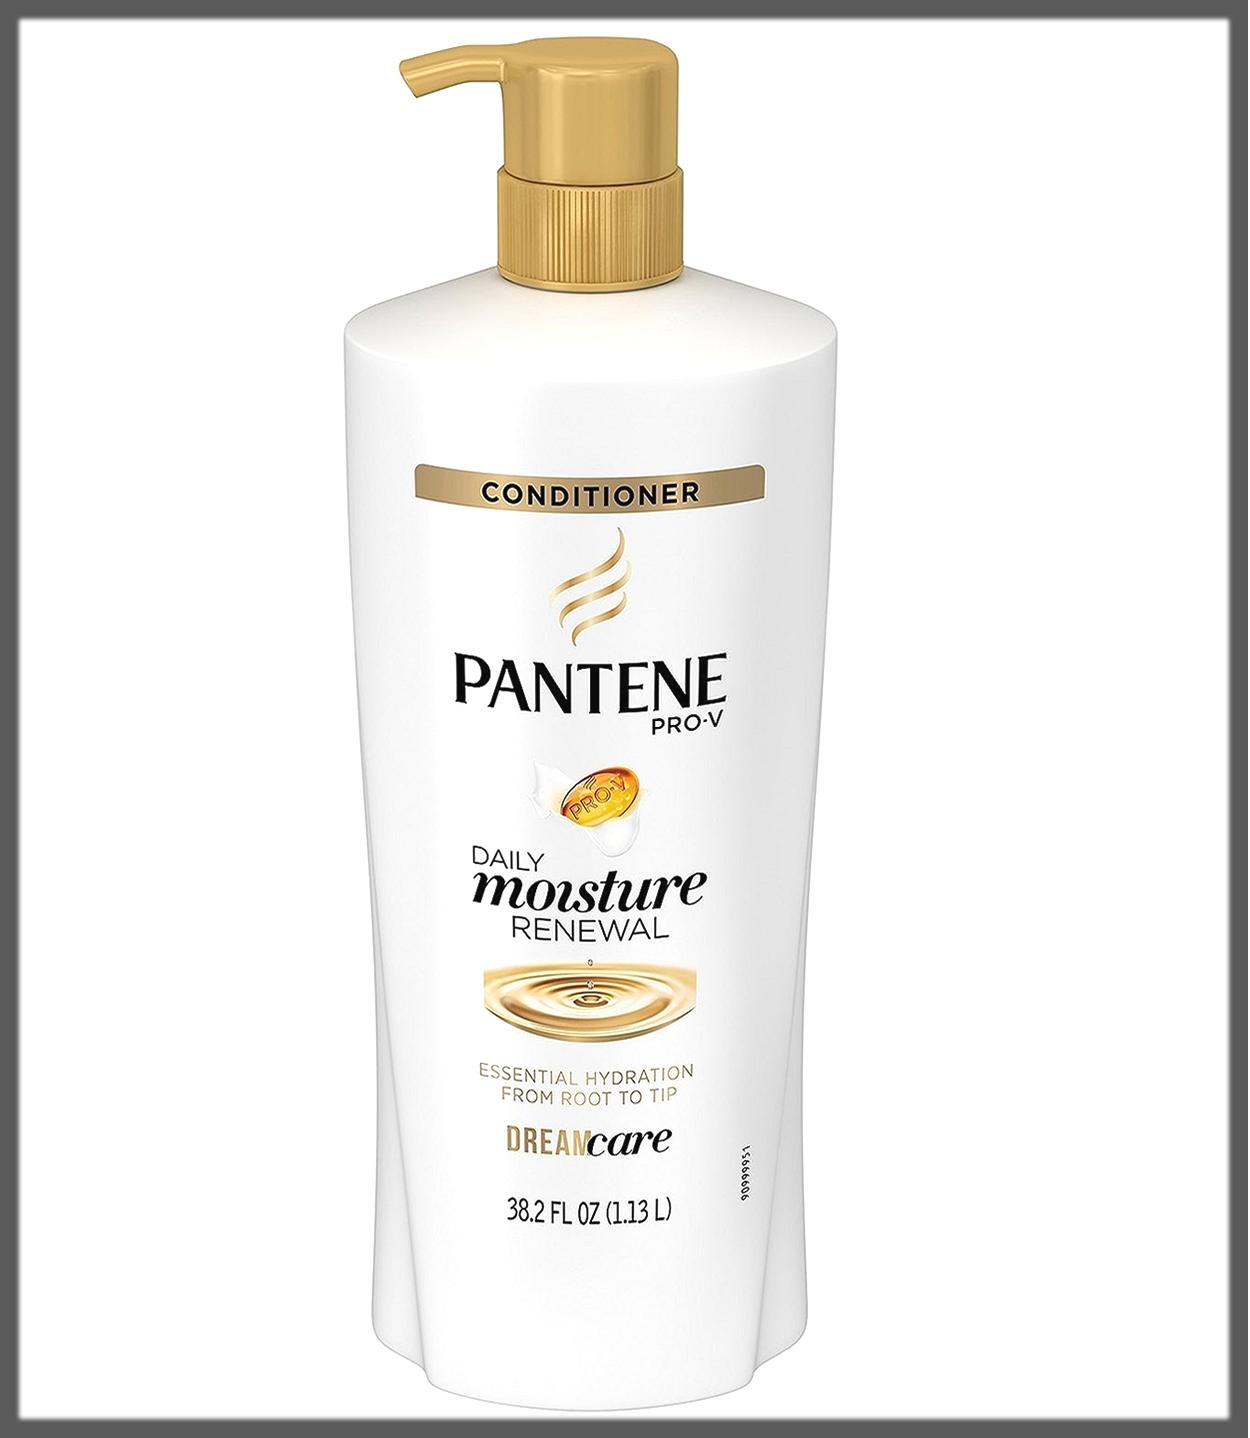 Pantene Pro-V Conditioner(Daily Moisture Renewal)